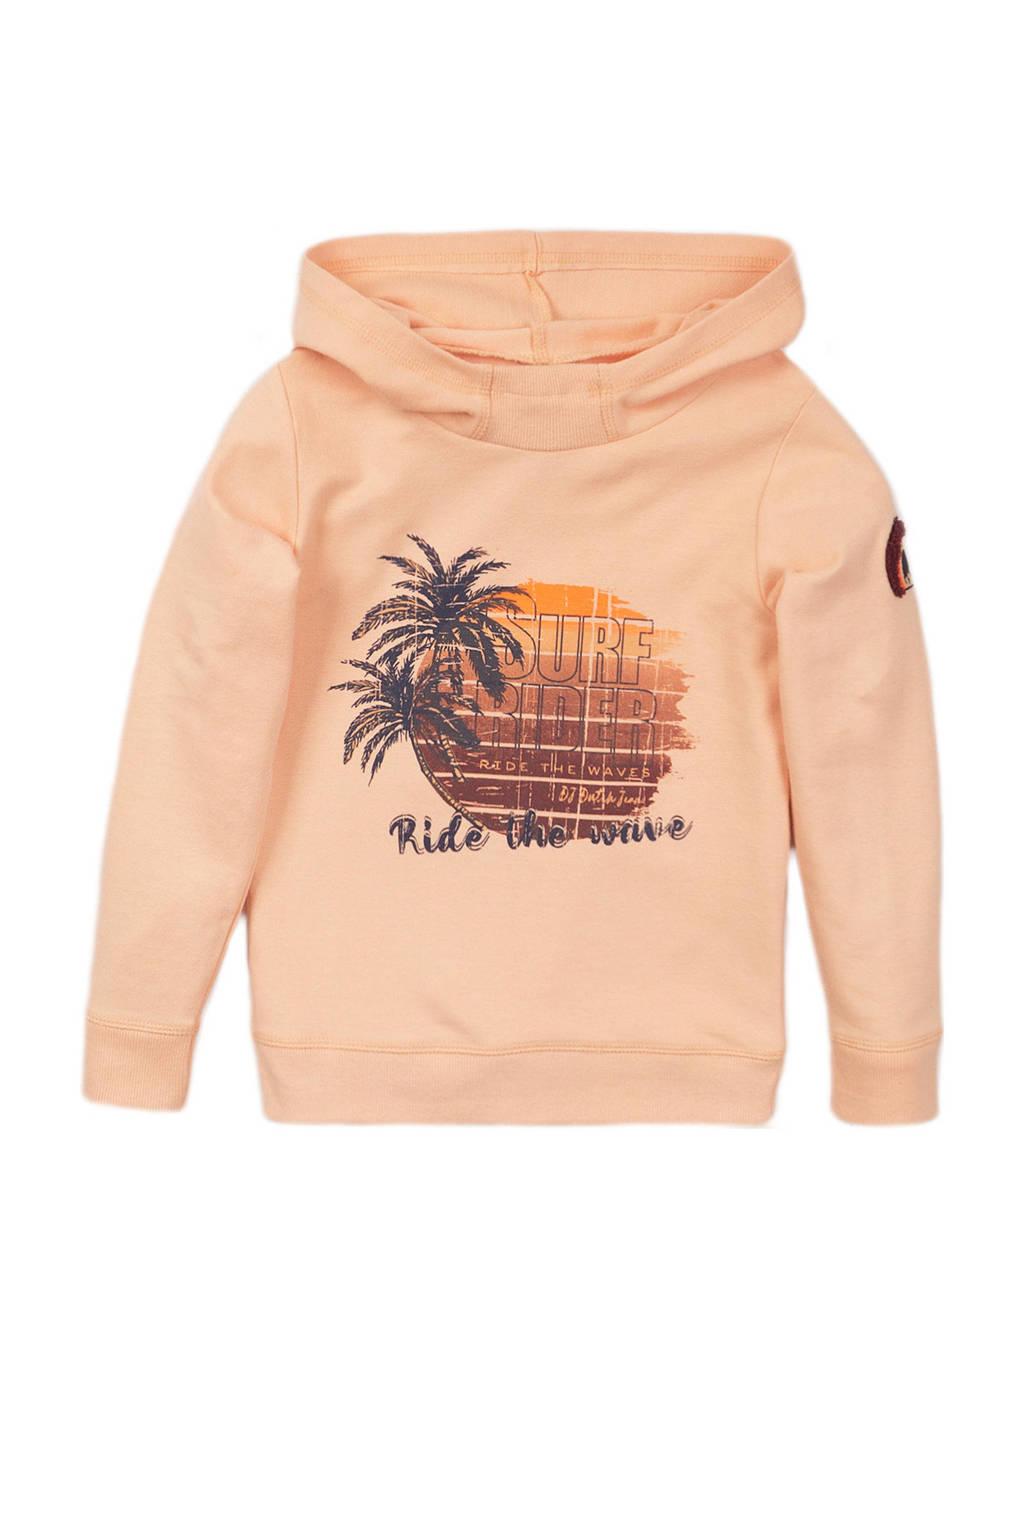 DJ Dutchjeans hoodie met printopdruk lichtoranje, Lichtoranje